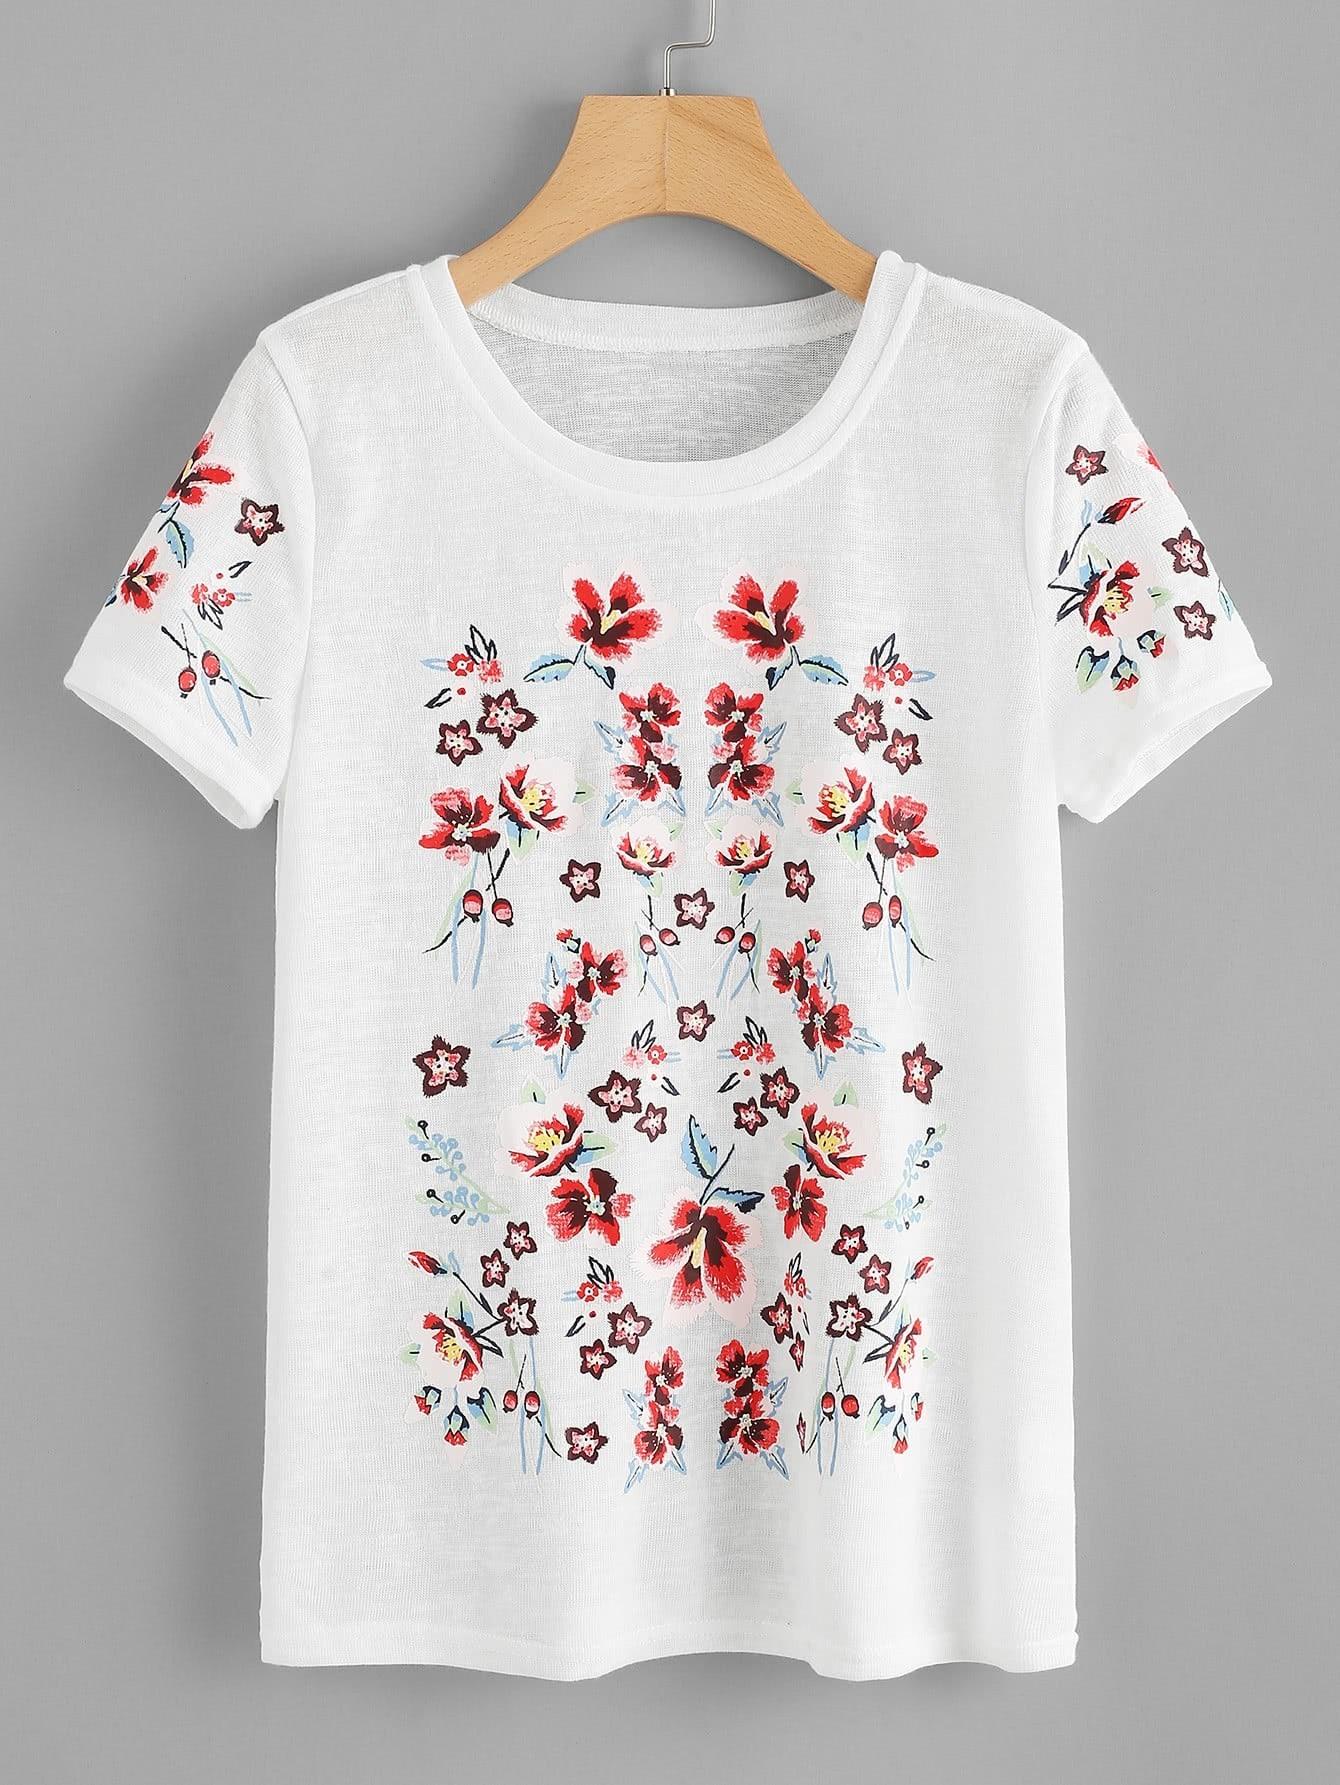 Flower Print Paper Thin T-shirt redfox футболка flower t 42 4300 желтый